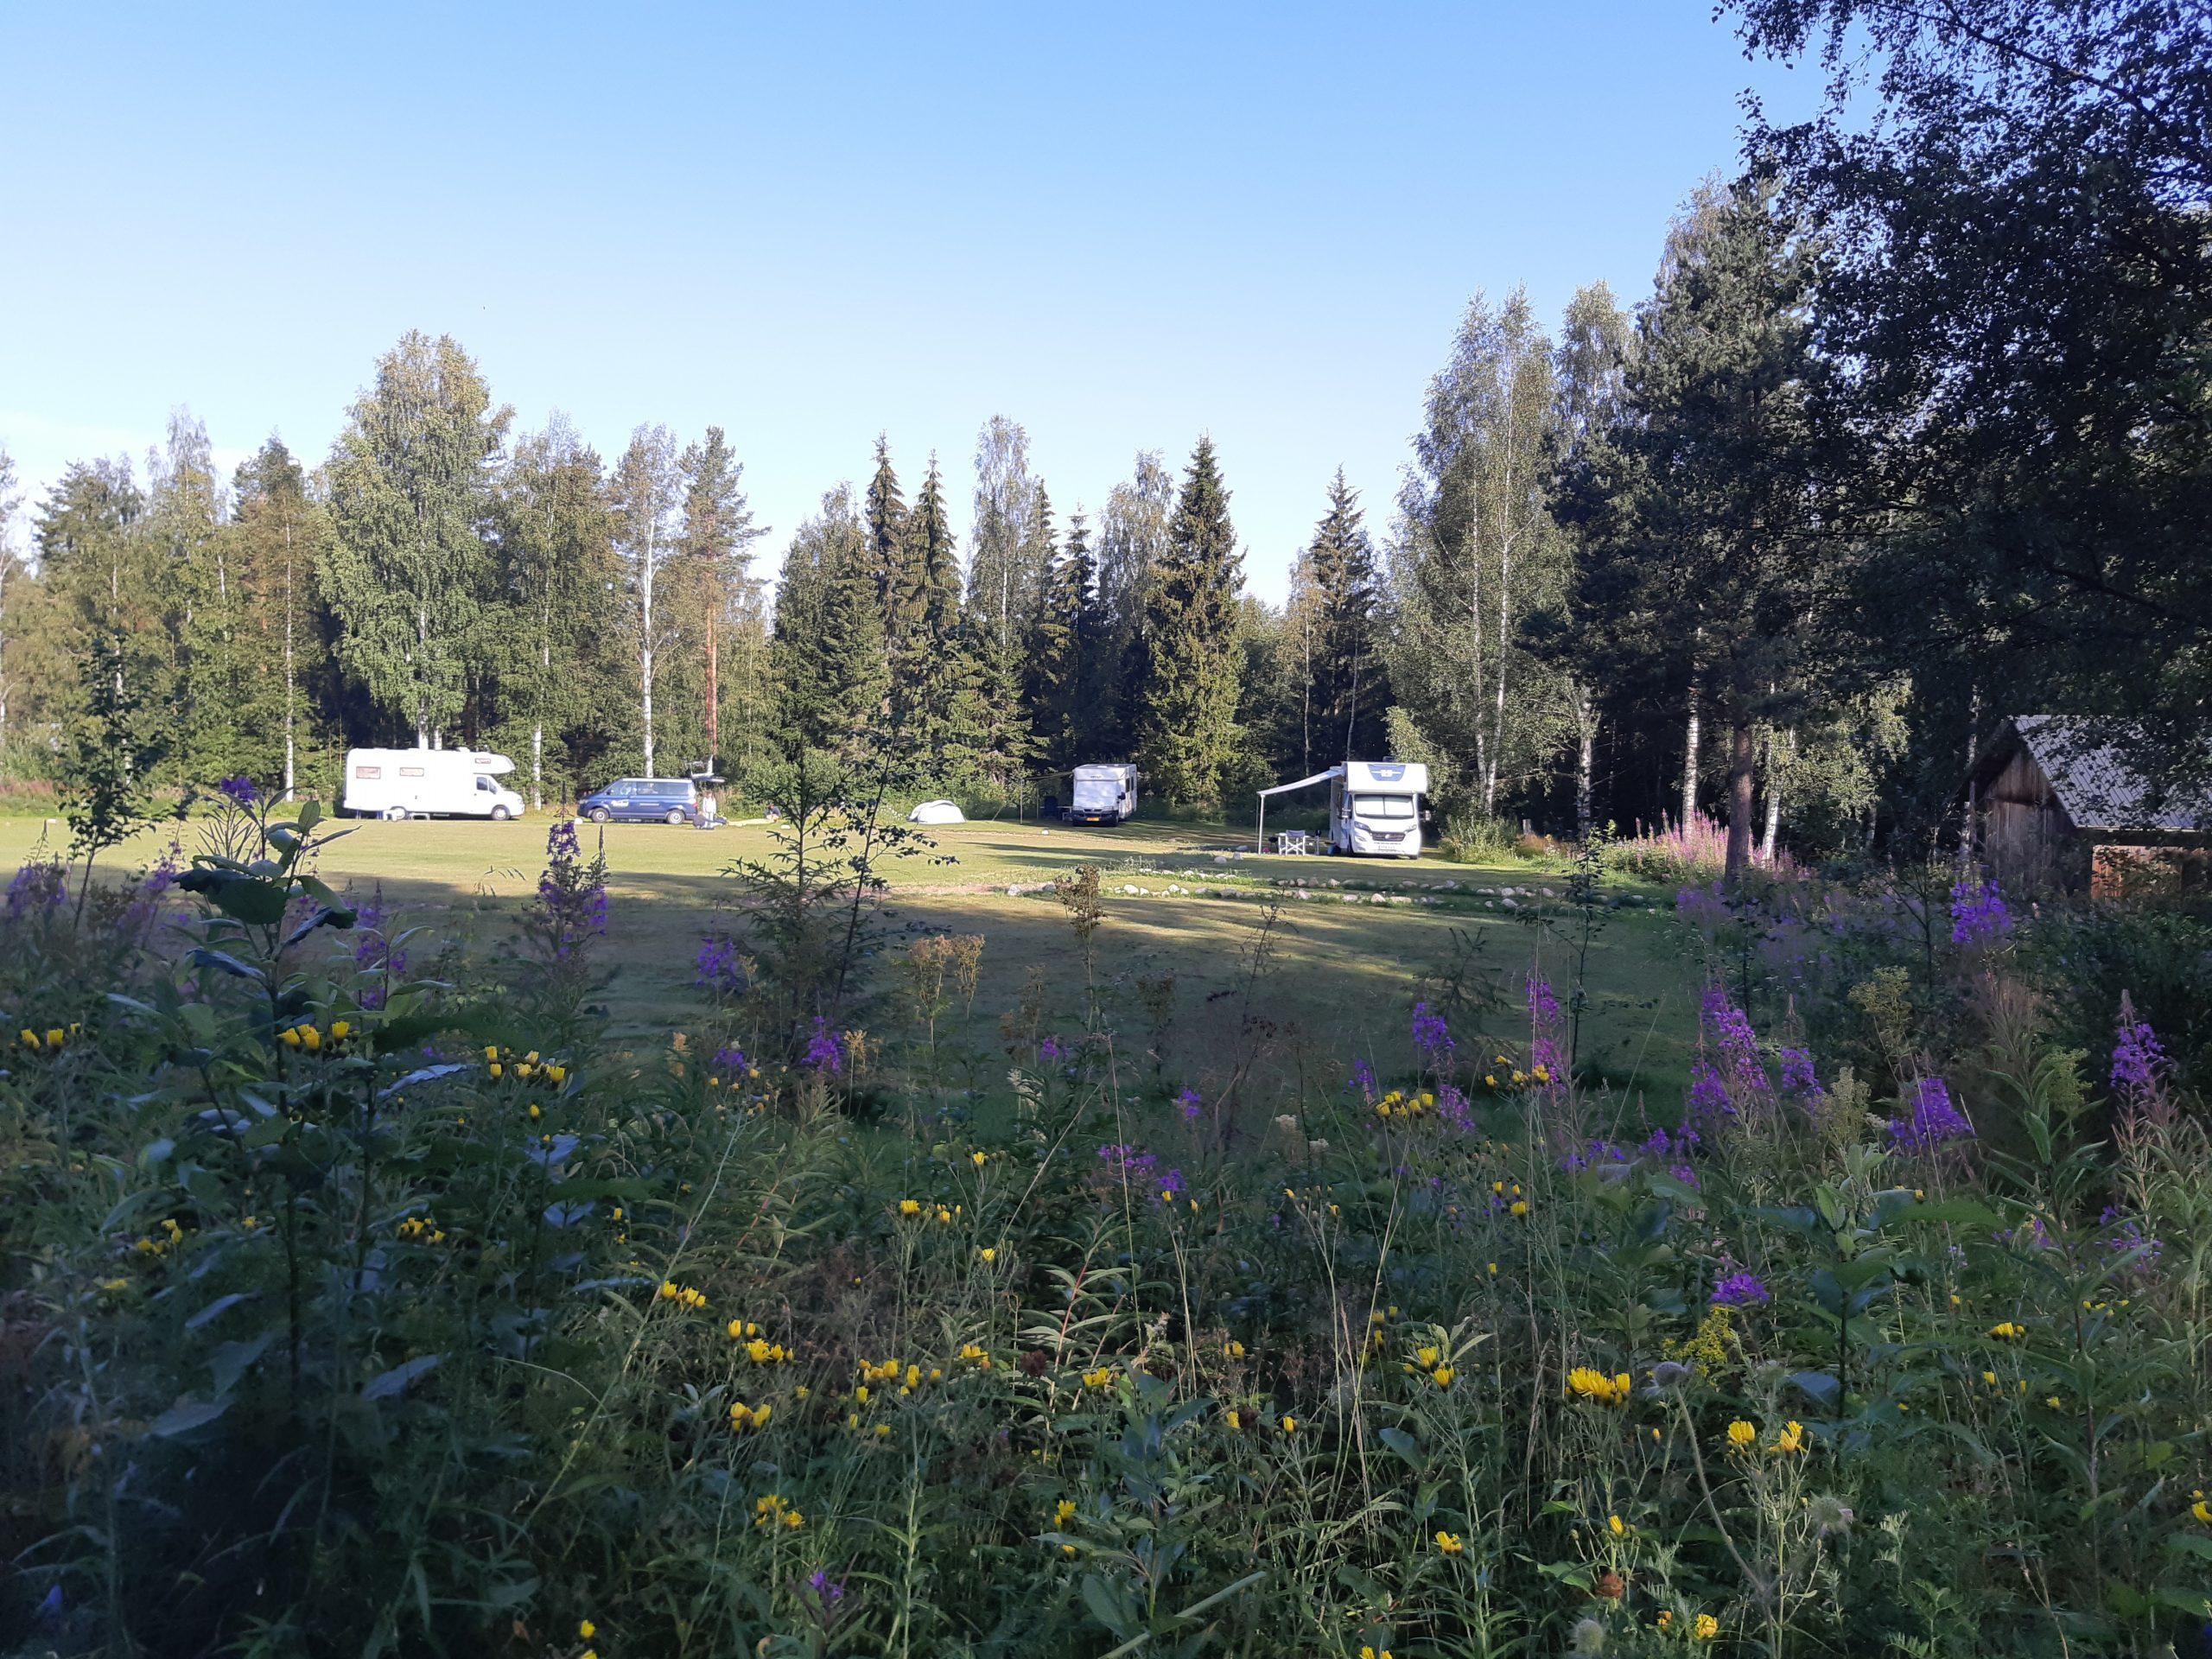 Wildlifesweden camping site